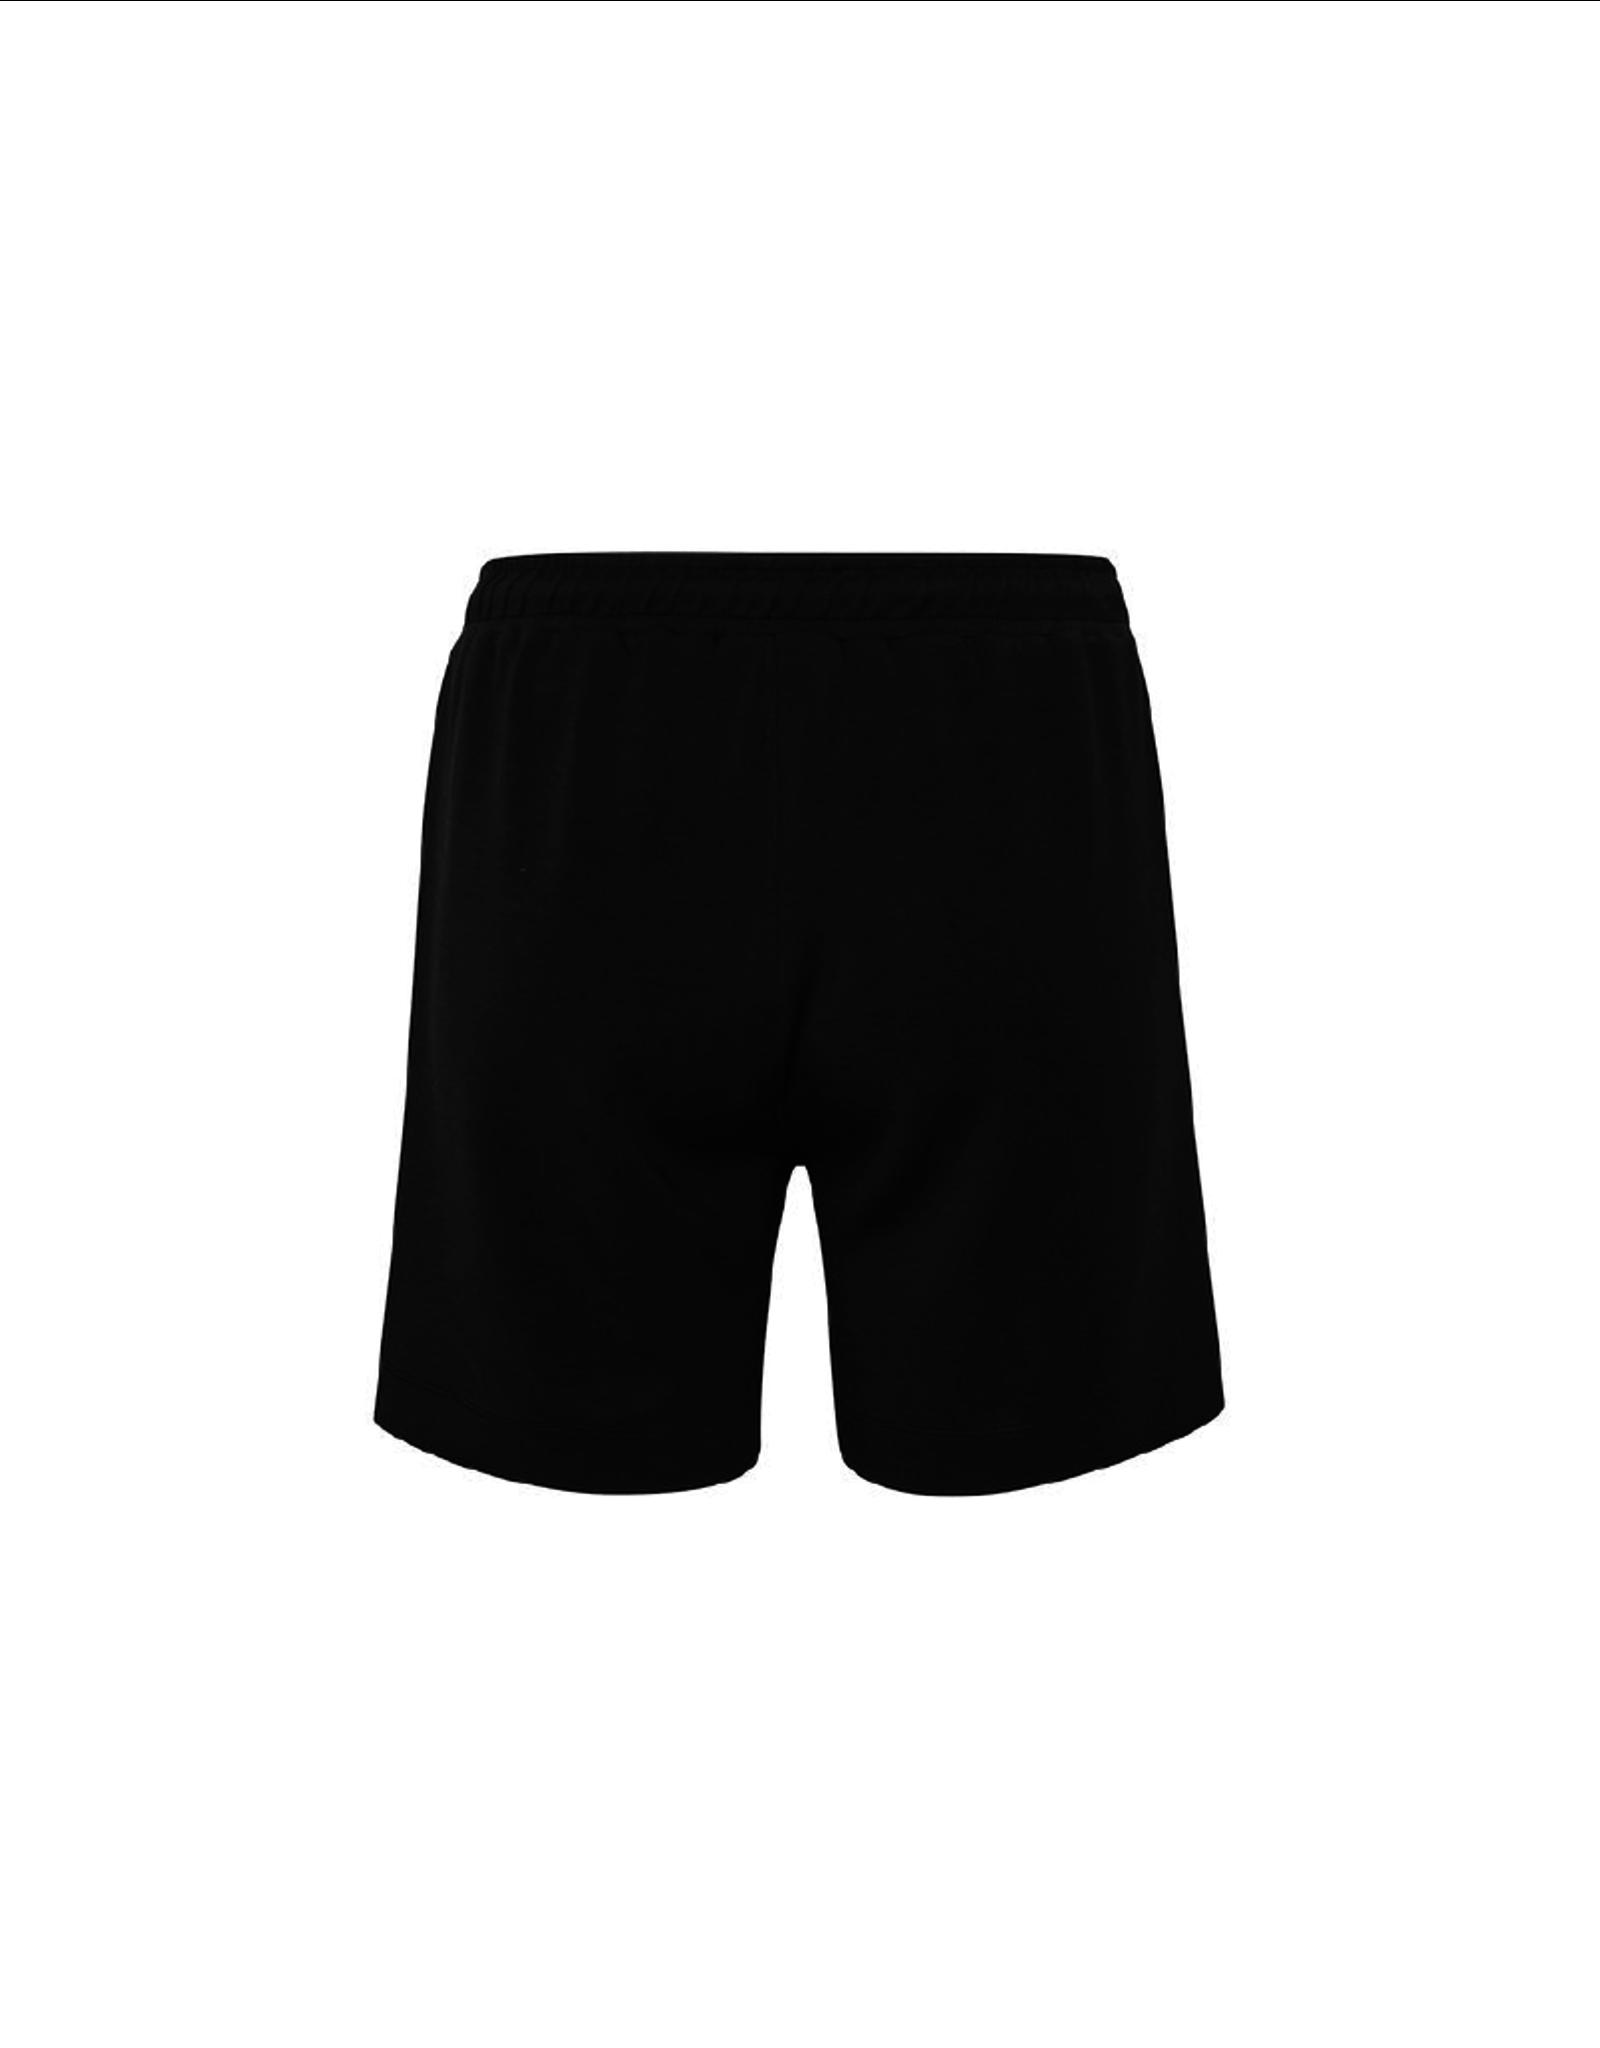 "Inwear Super Soft 6"" Shorts"